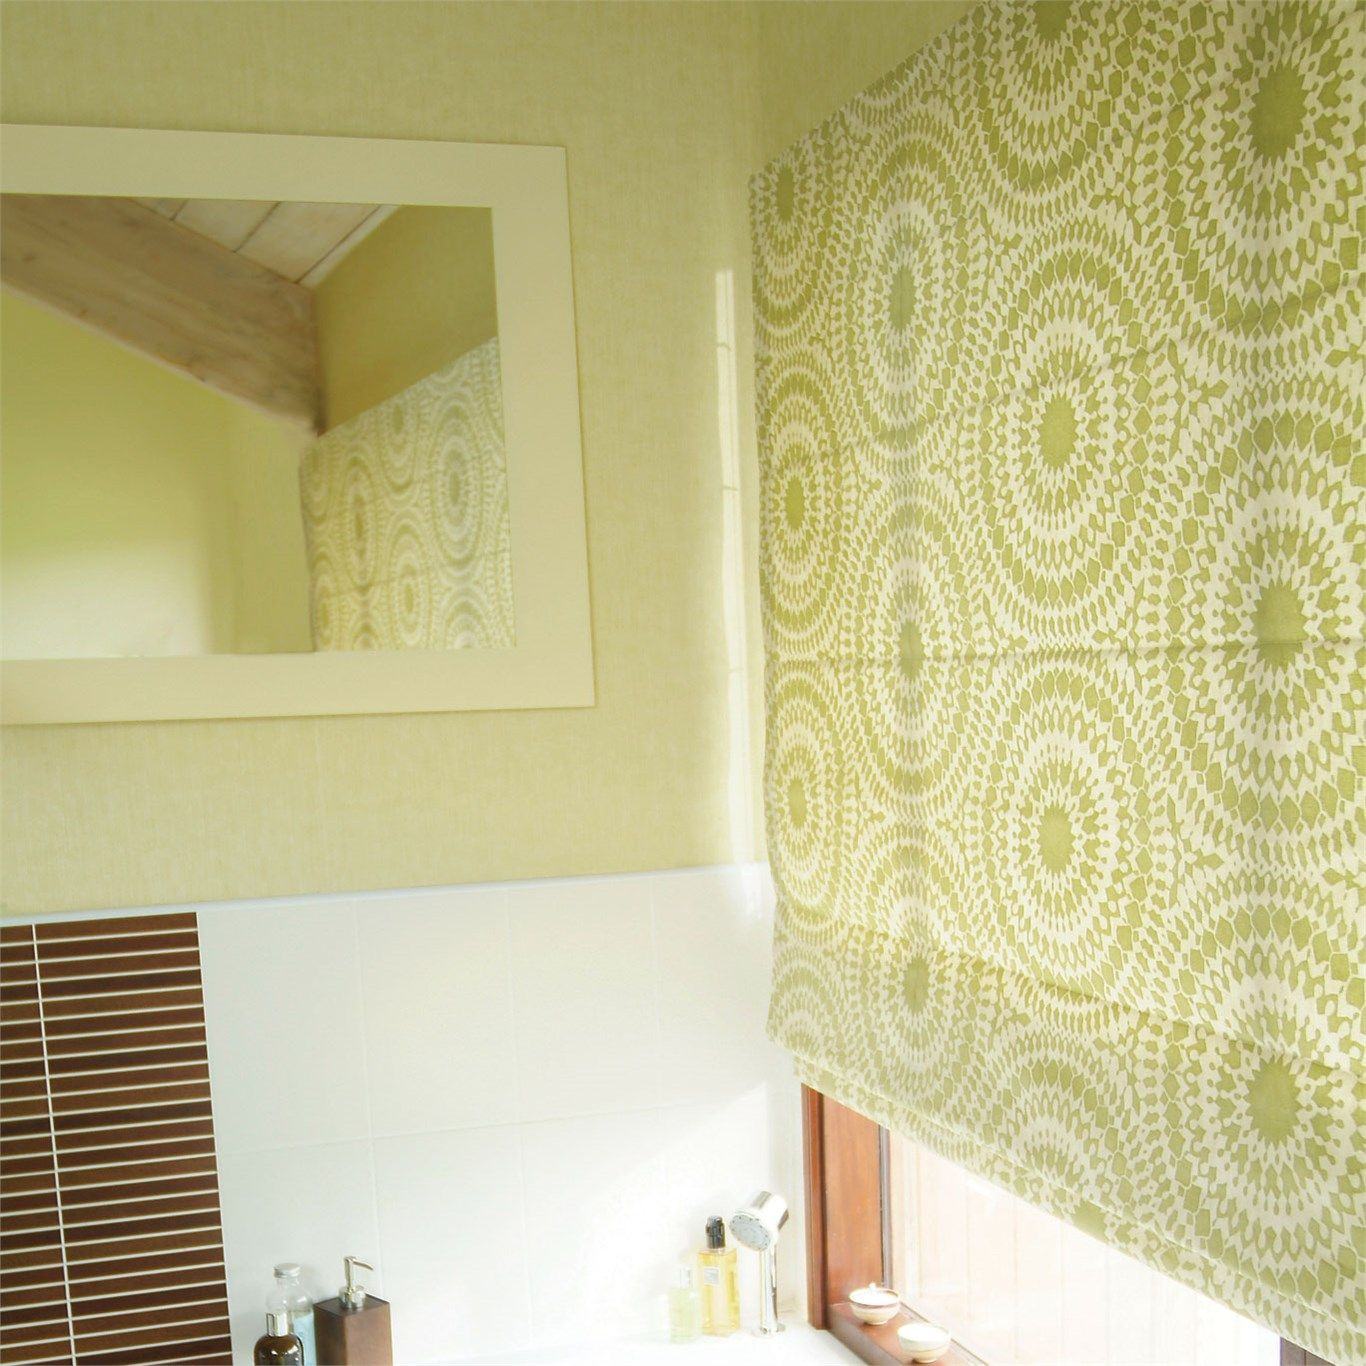 Harlequin - Designer Fabrics and Wallcoverings | Products | British/UK Fabrics and Wallpapers | Bakari (HLR26816) | Textures and Plains